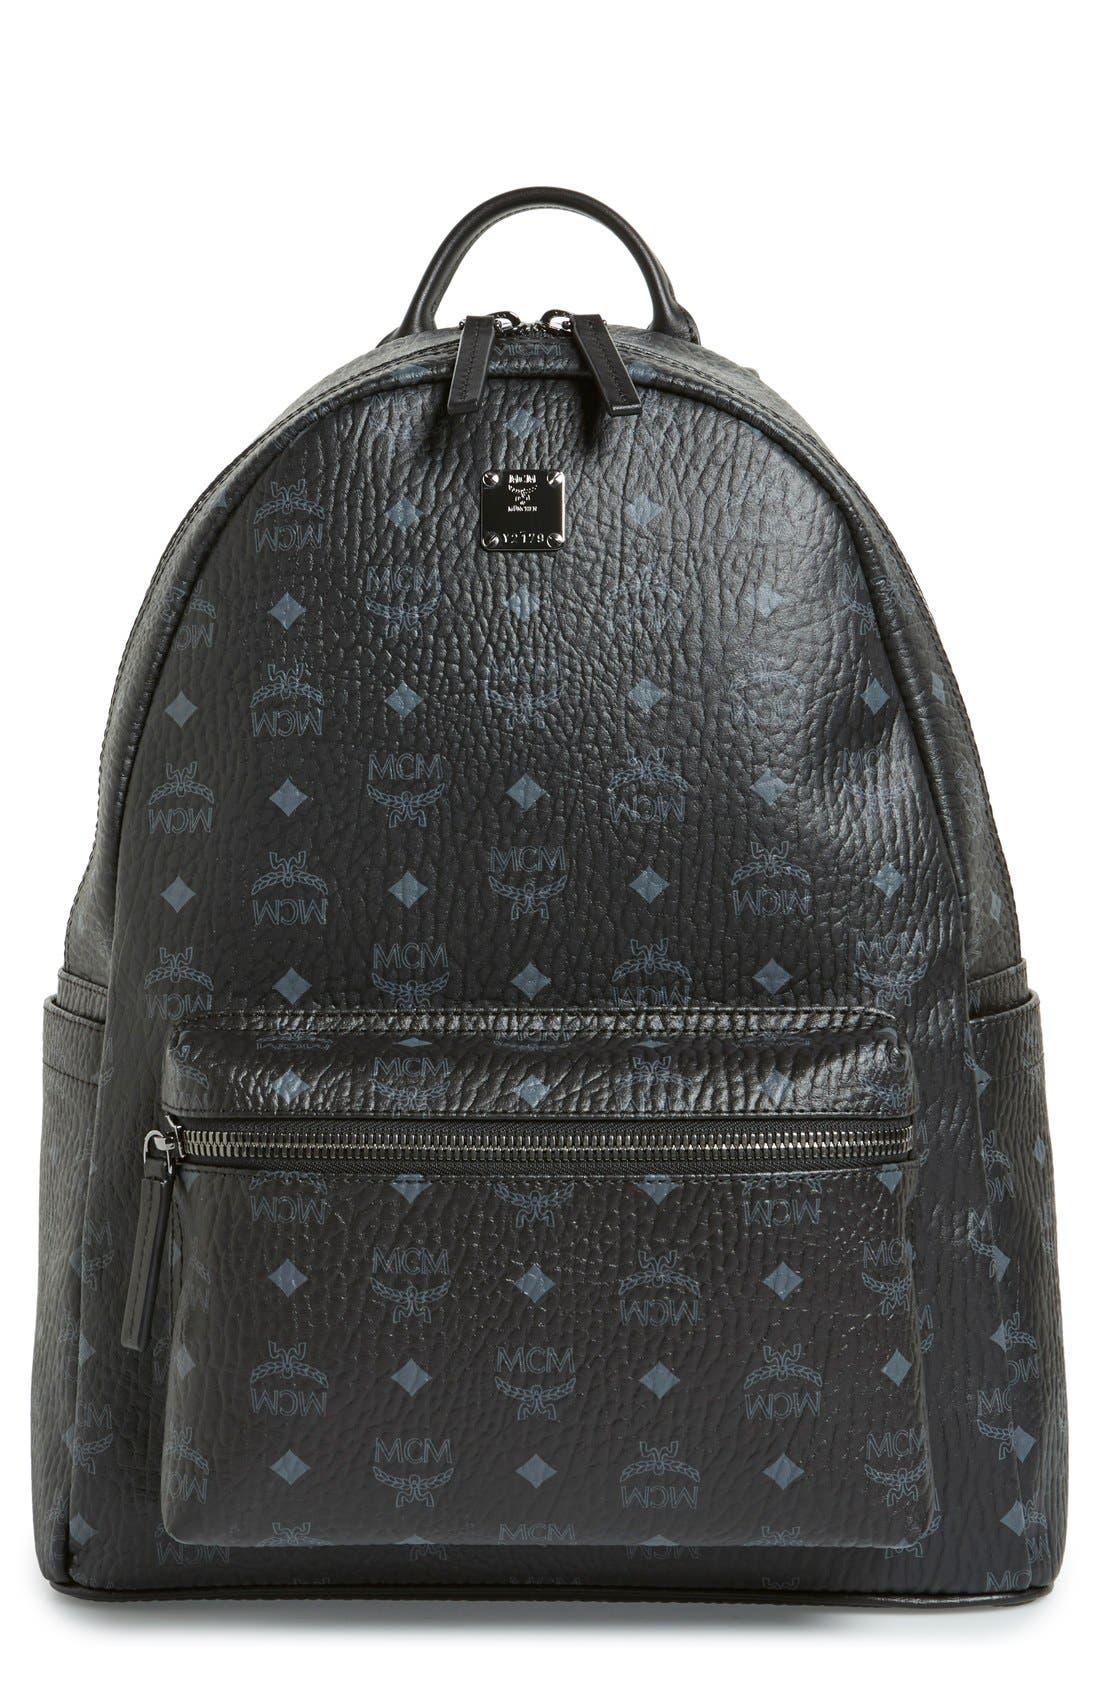 Medium Stark - Visetos Backpack,                         Main,                         color, BLACK